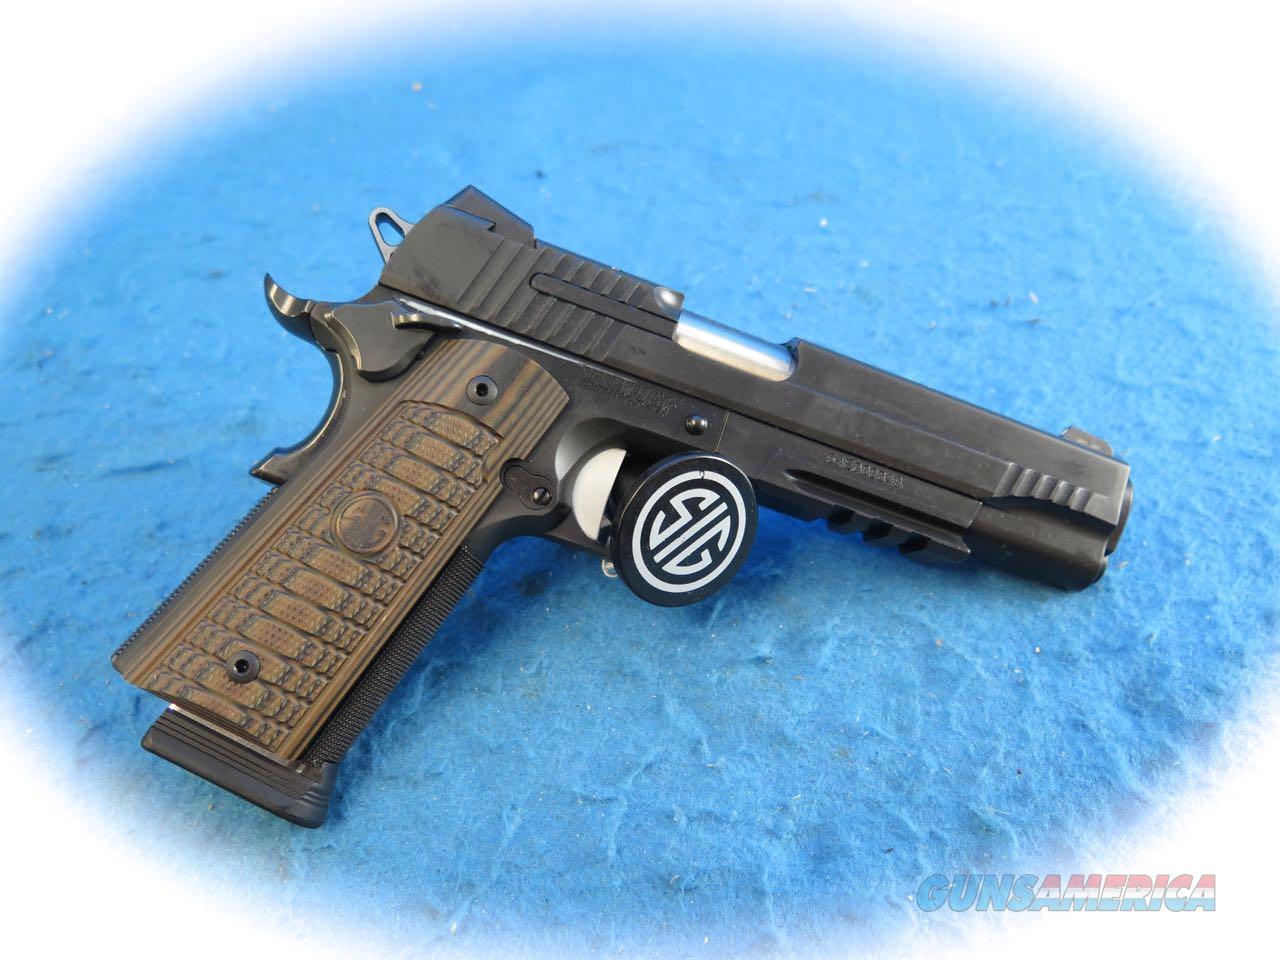 Sig Sauer 1911Select .45 ACP Pistol Model 1911R-45-SEL **New**  Guns > Pistols > Sig - Sauer/Sigarms Pistols > 1911